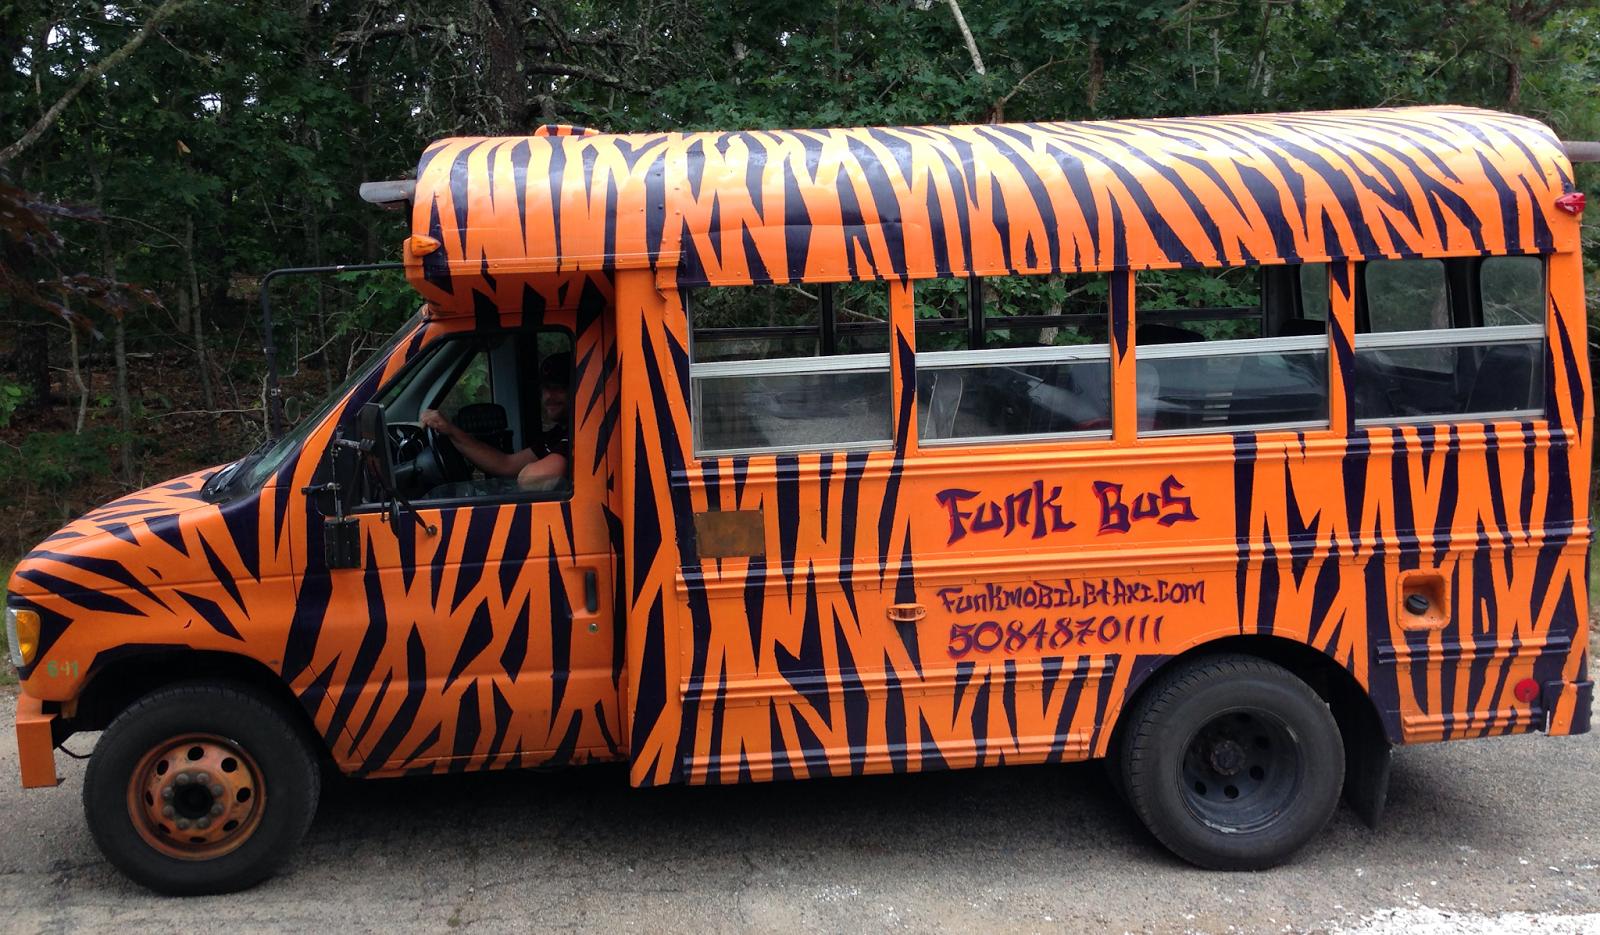 funk bus, cape cod, bachelorette weekend cape cod